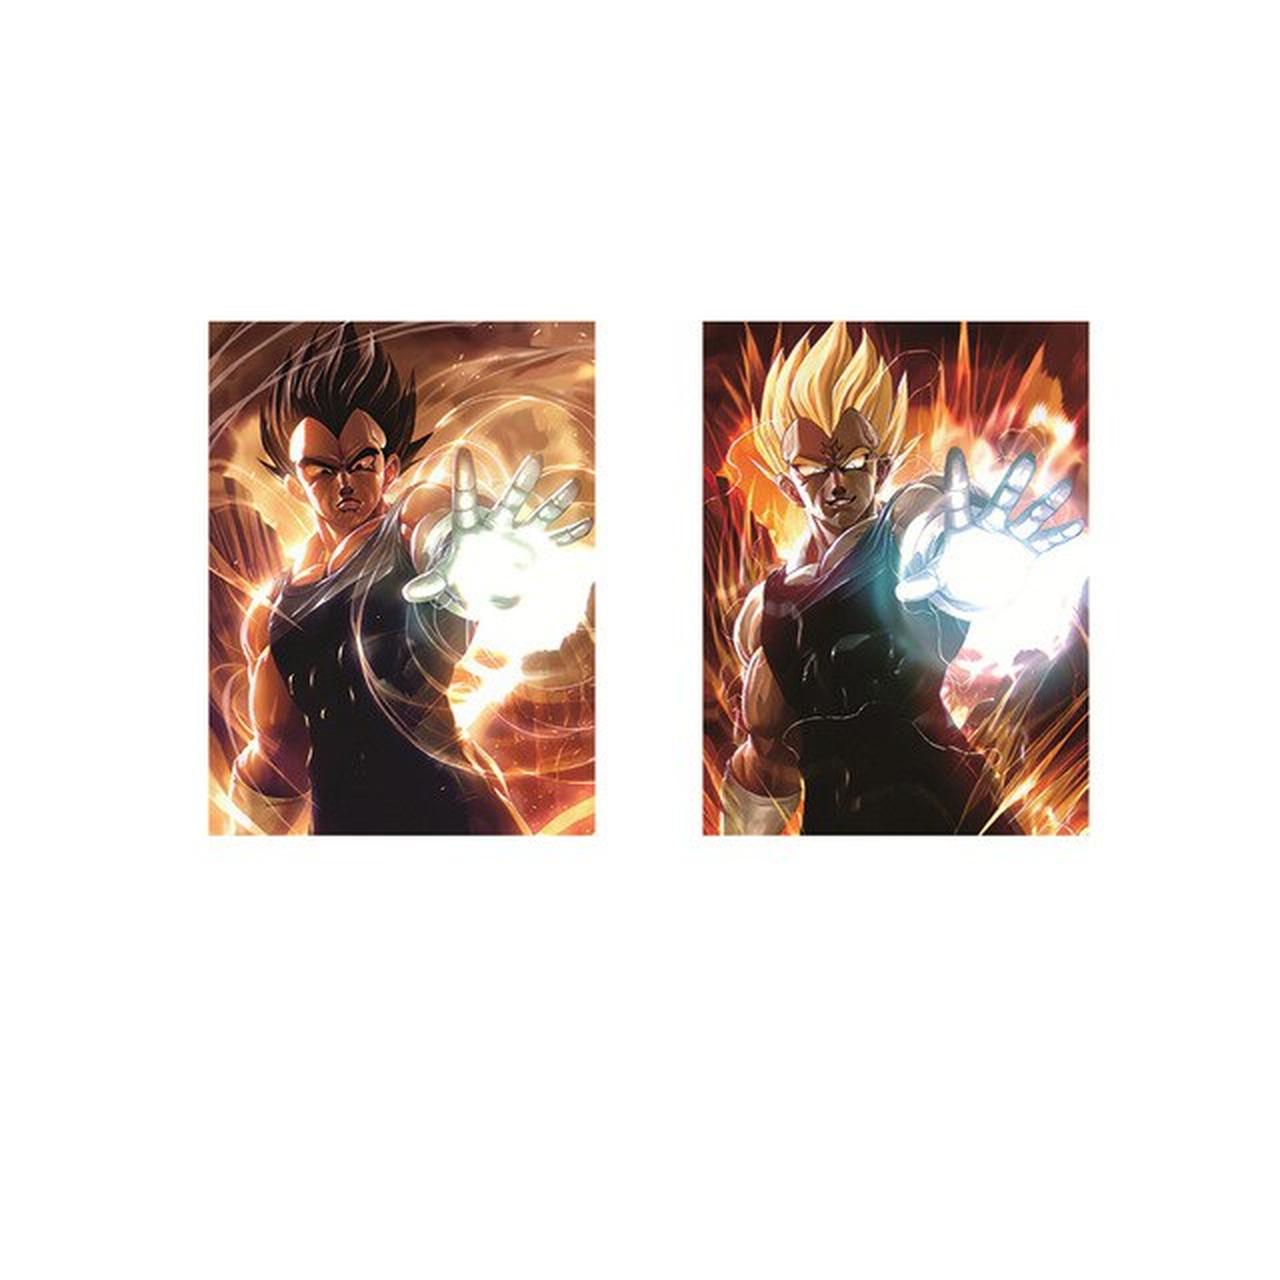 Quadro 3D Lenticular: Vegeta & Majin Vegeta: Dragon Ball Z (40x30)